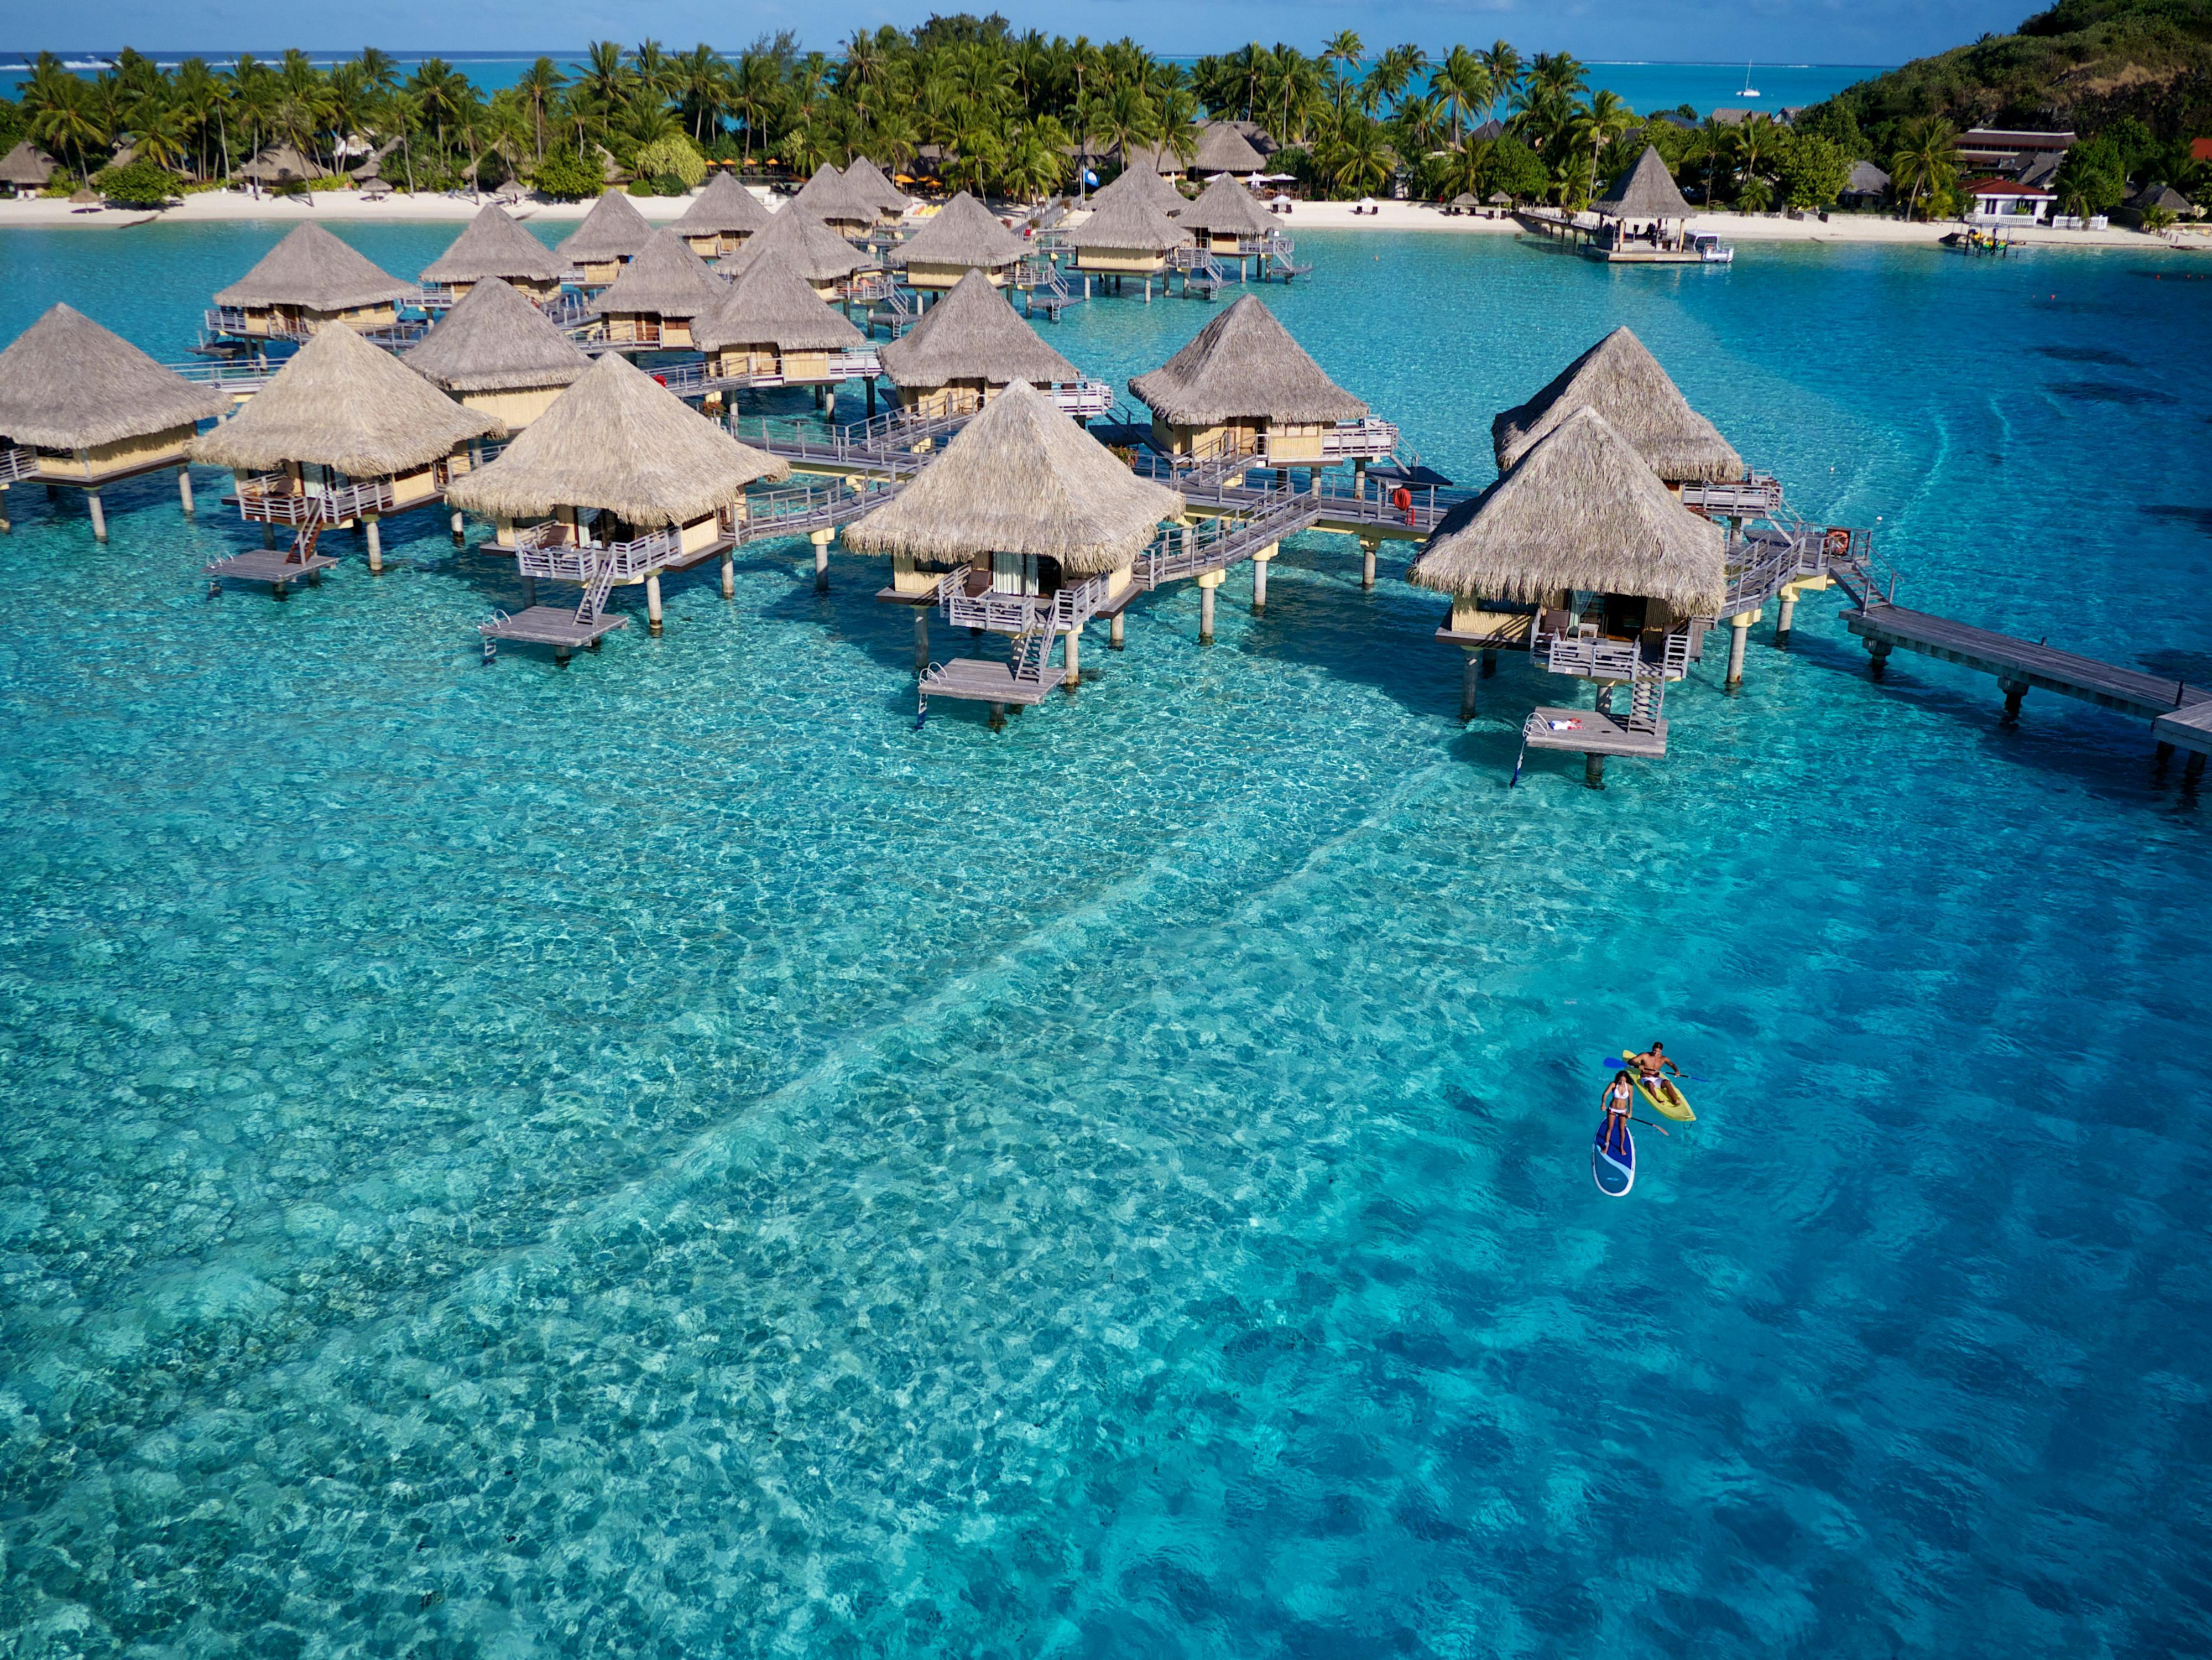 Intercontinental Le Moana Bora Bora Bora Bora Polyn 233 Sie Fran 231 Aise